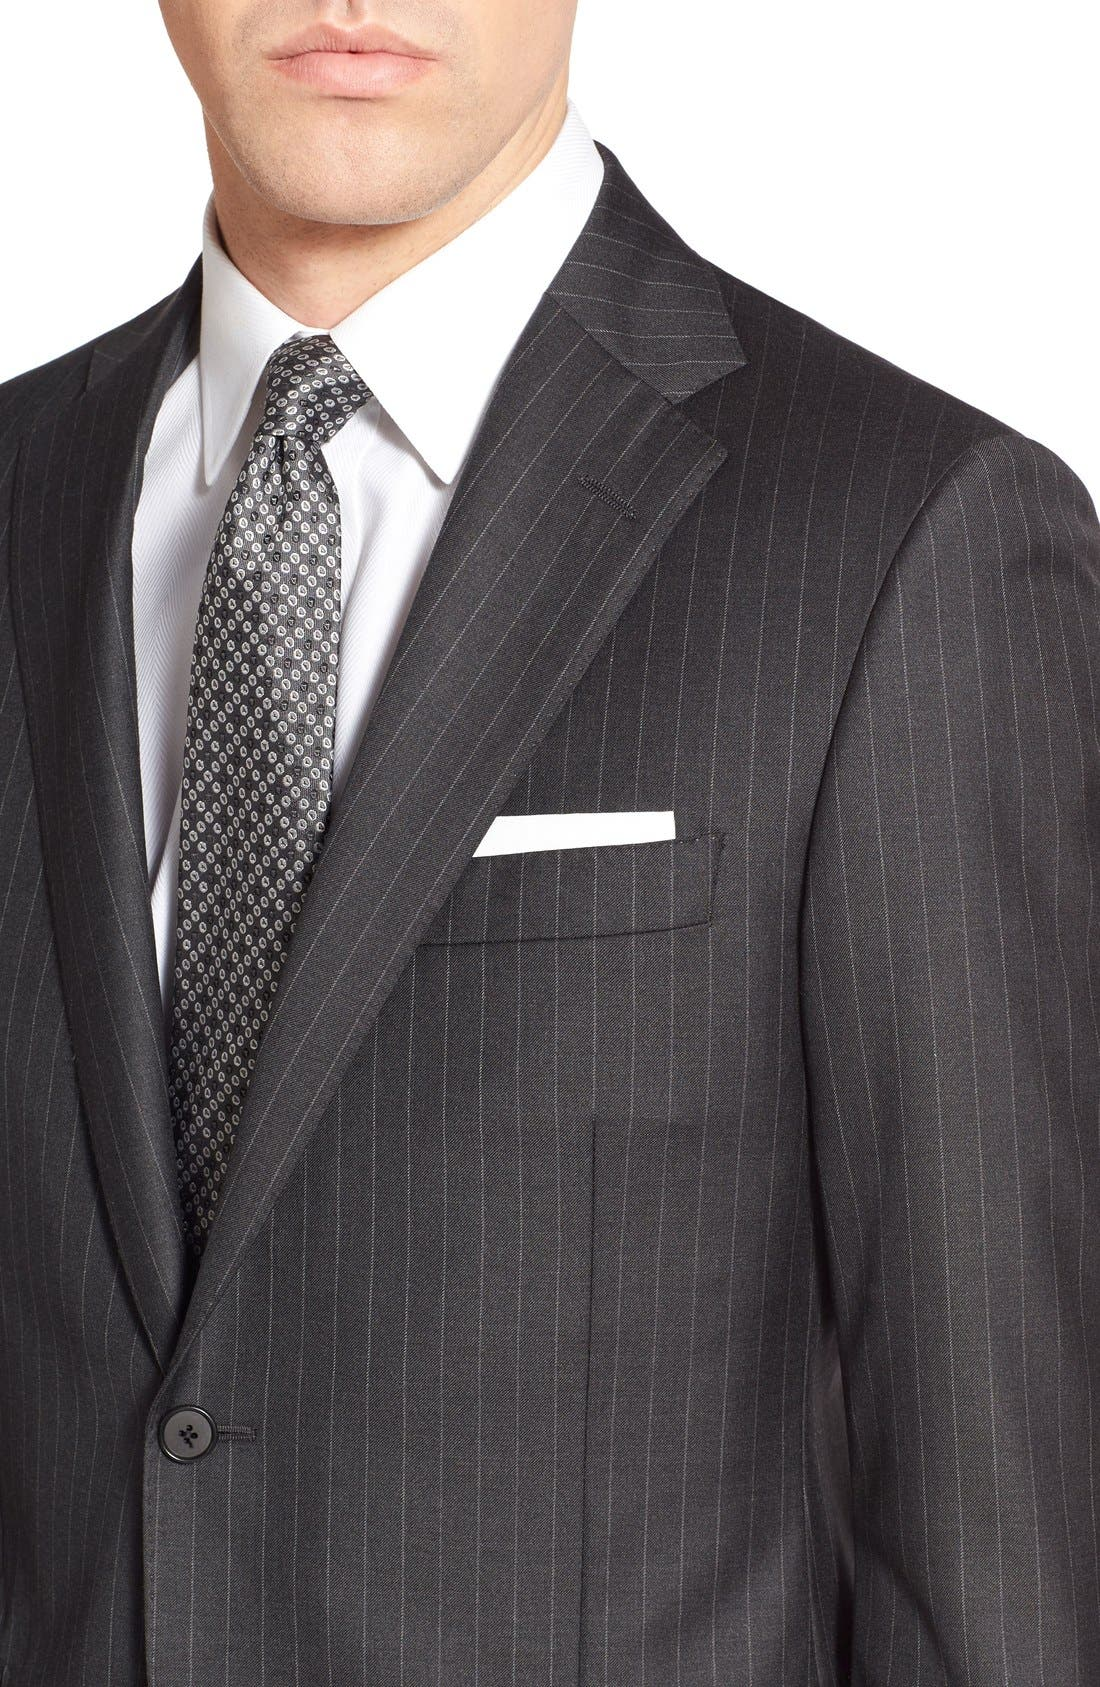 'Beacon - B Series' Classic Fit Stripe Wool Suit,                             Alternate thumbnail 5, color,                             Grey